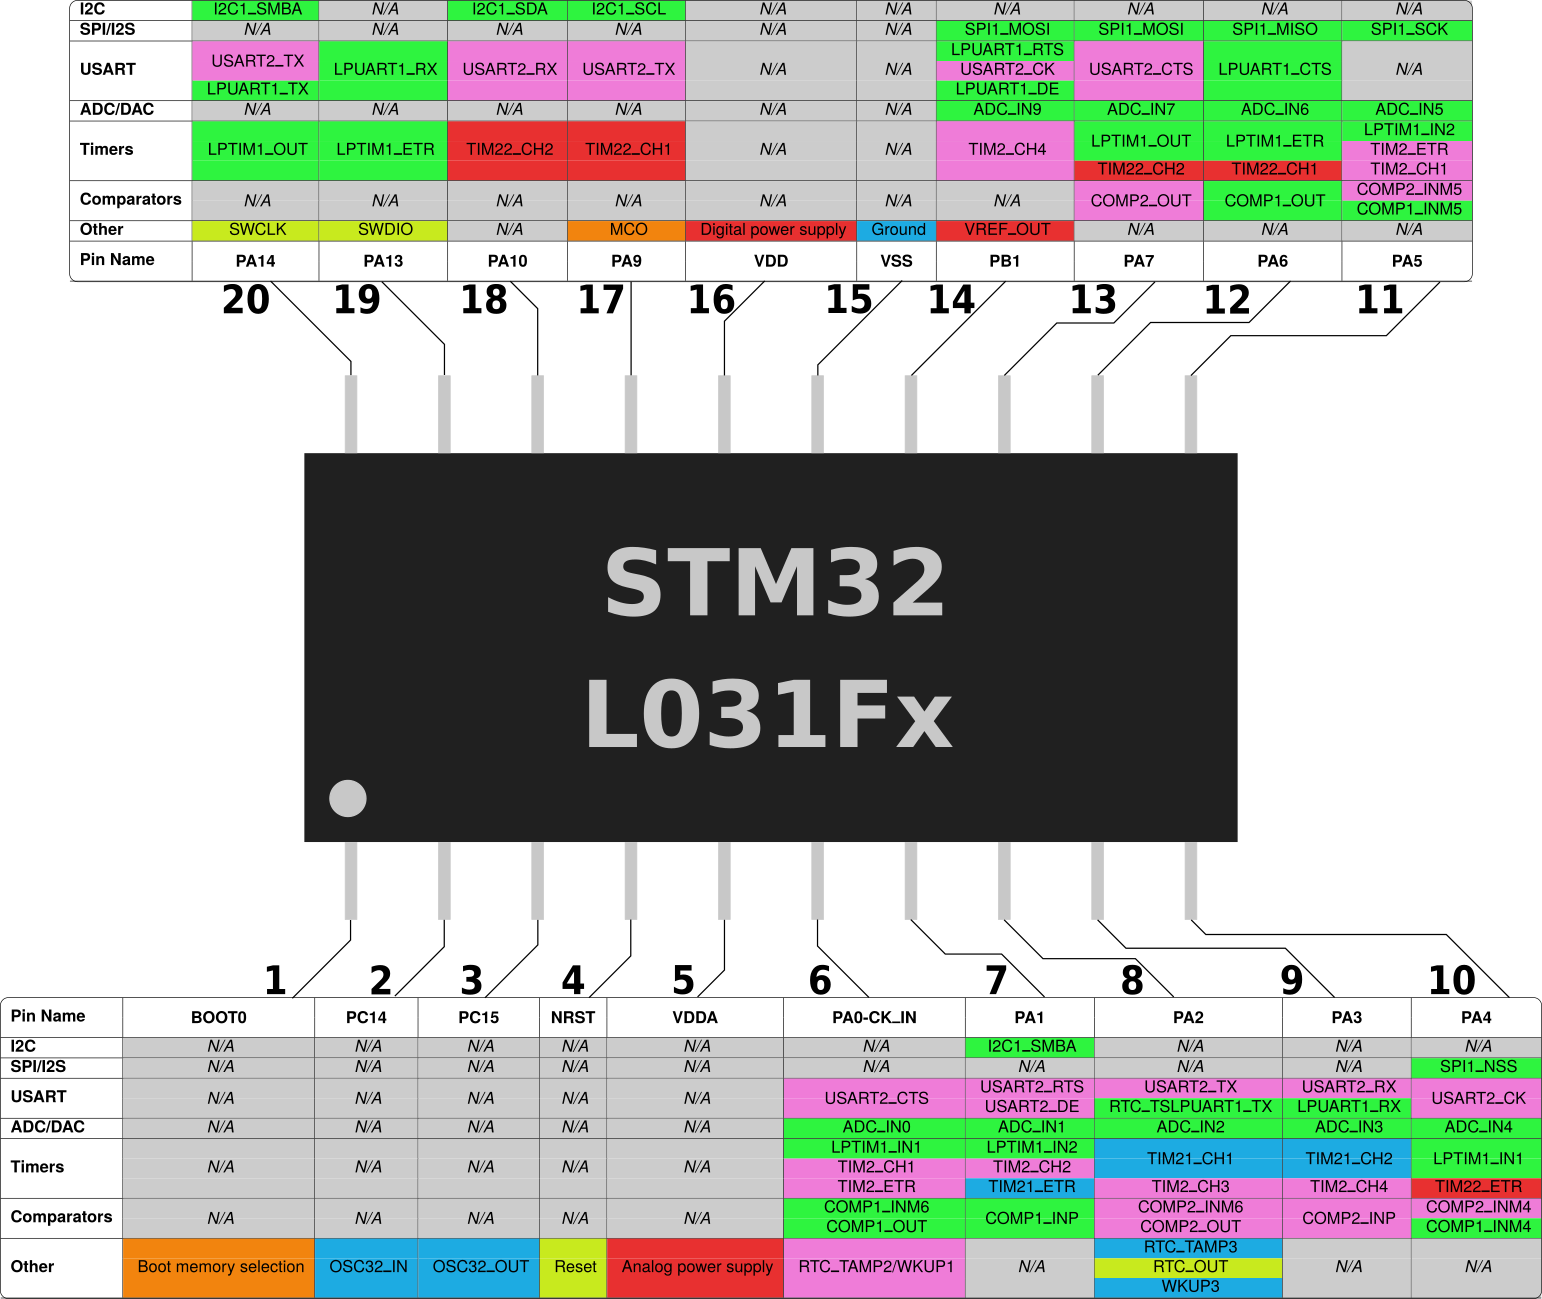 STM32L031Fx